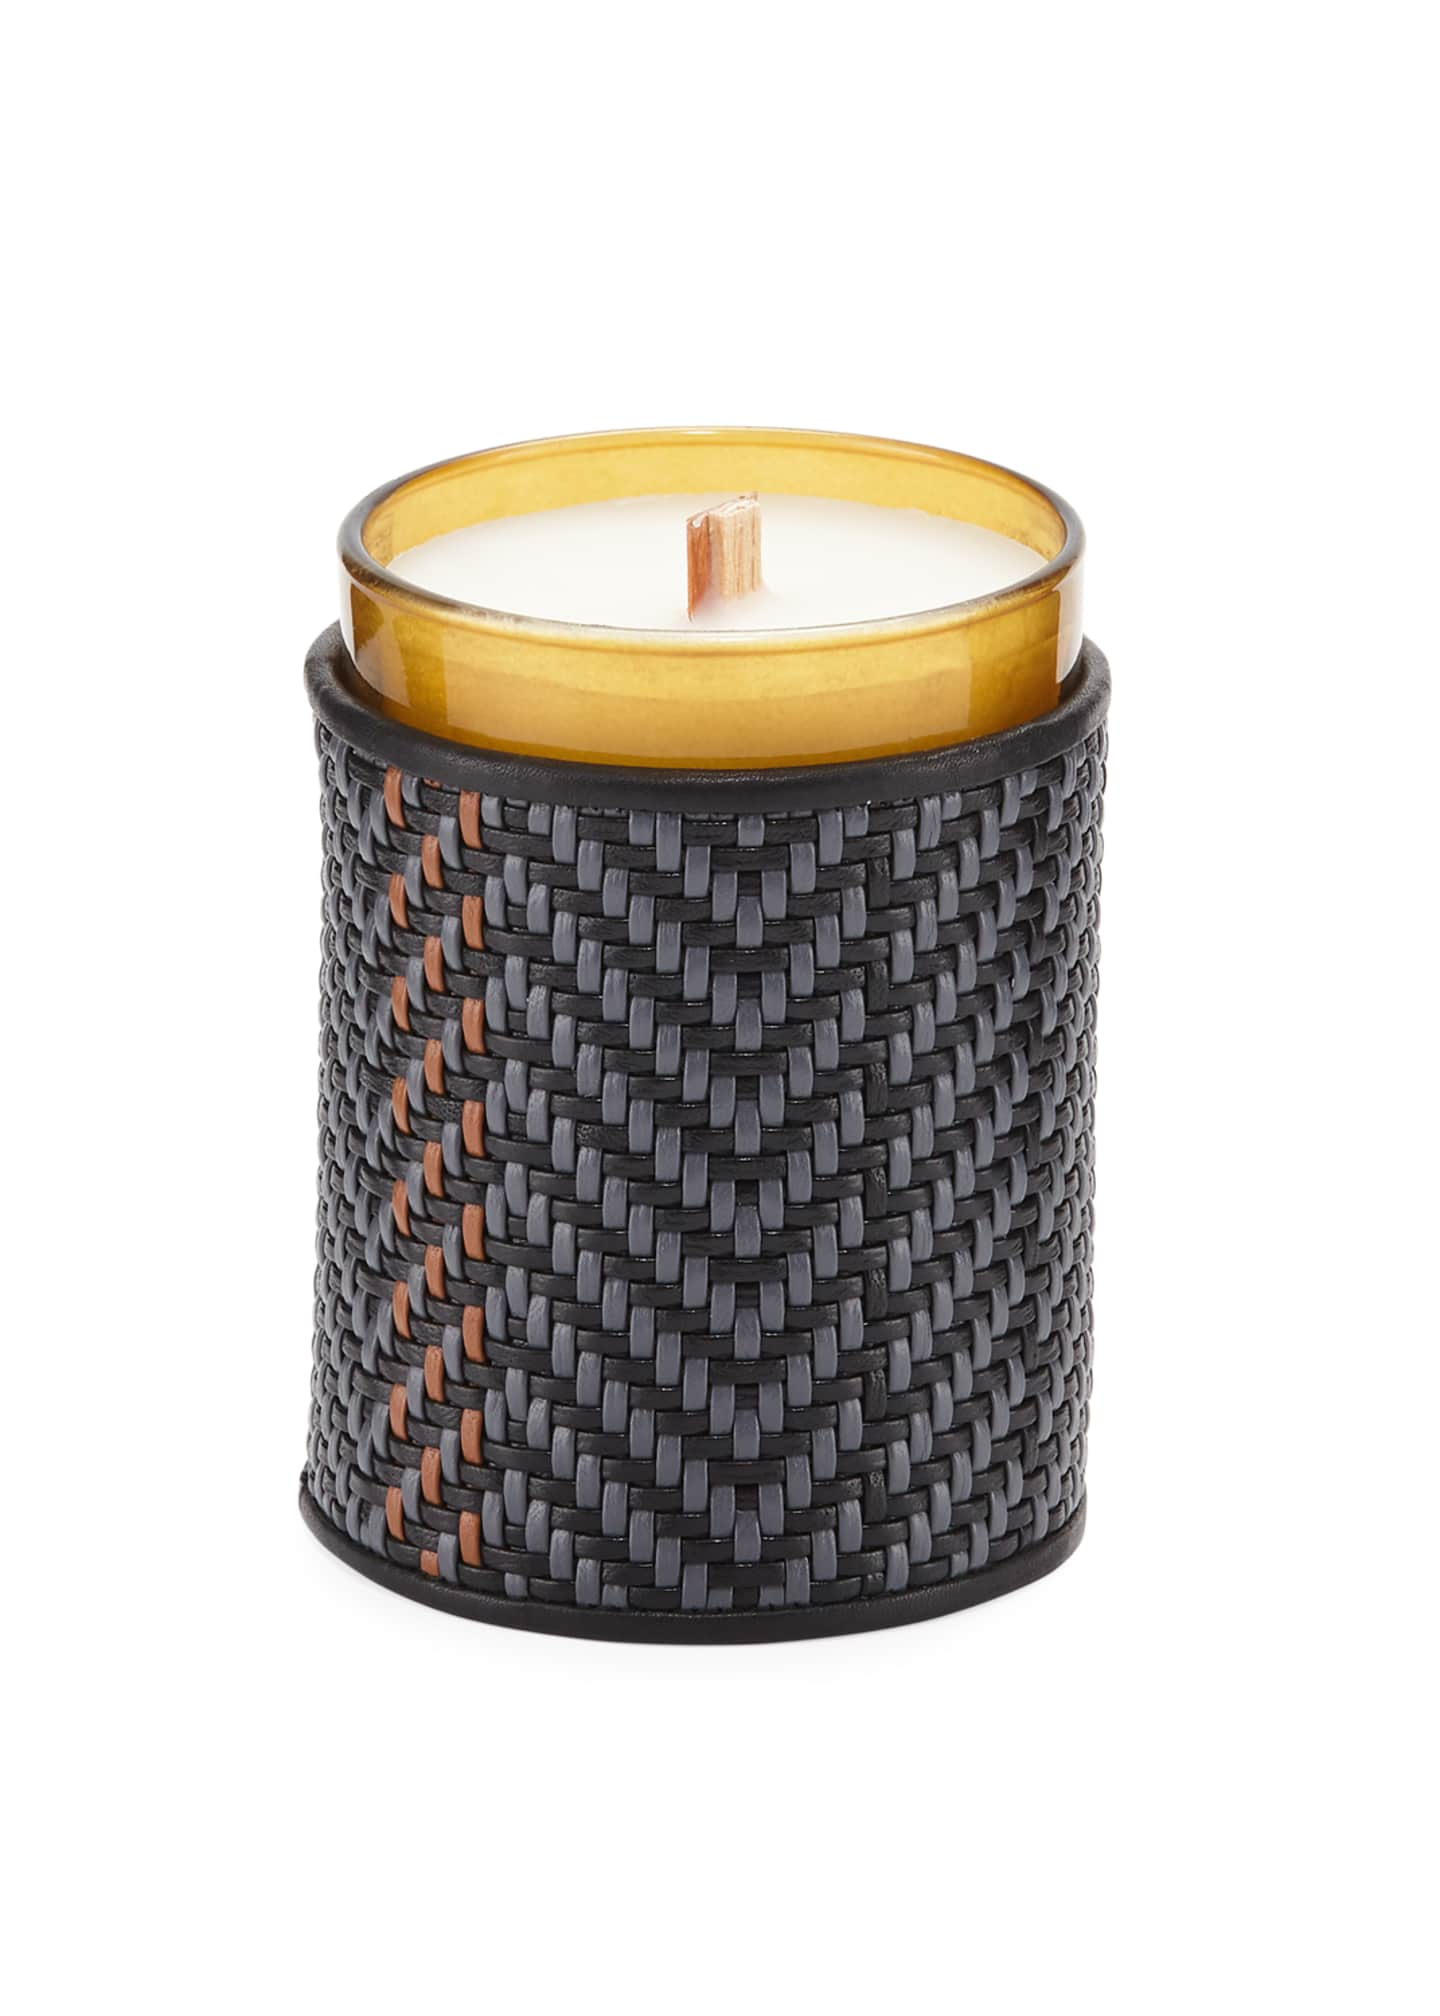 Ermenegildo Zegna Pelle Tessuta Candleholder with Candle